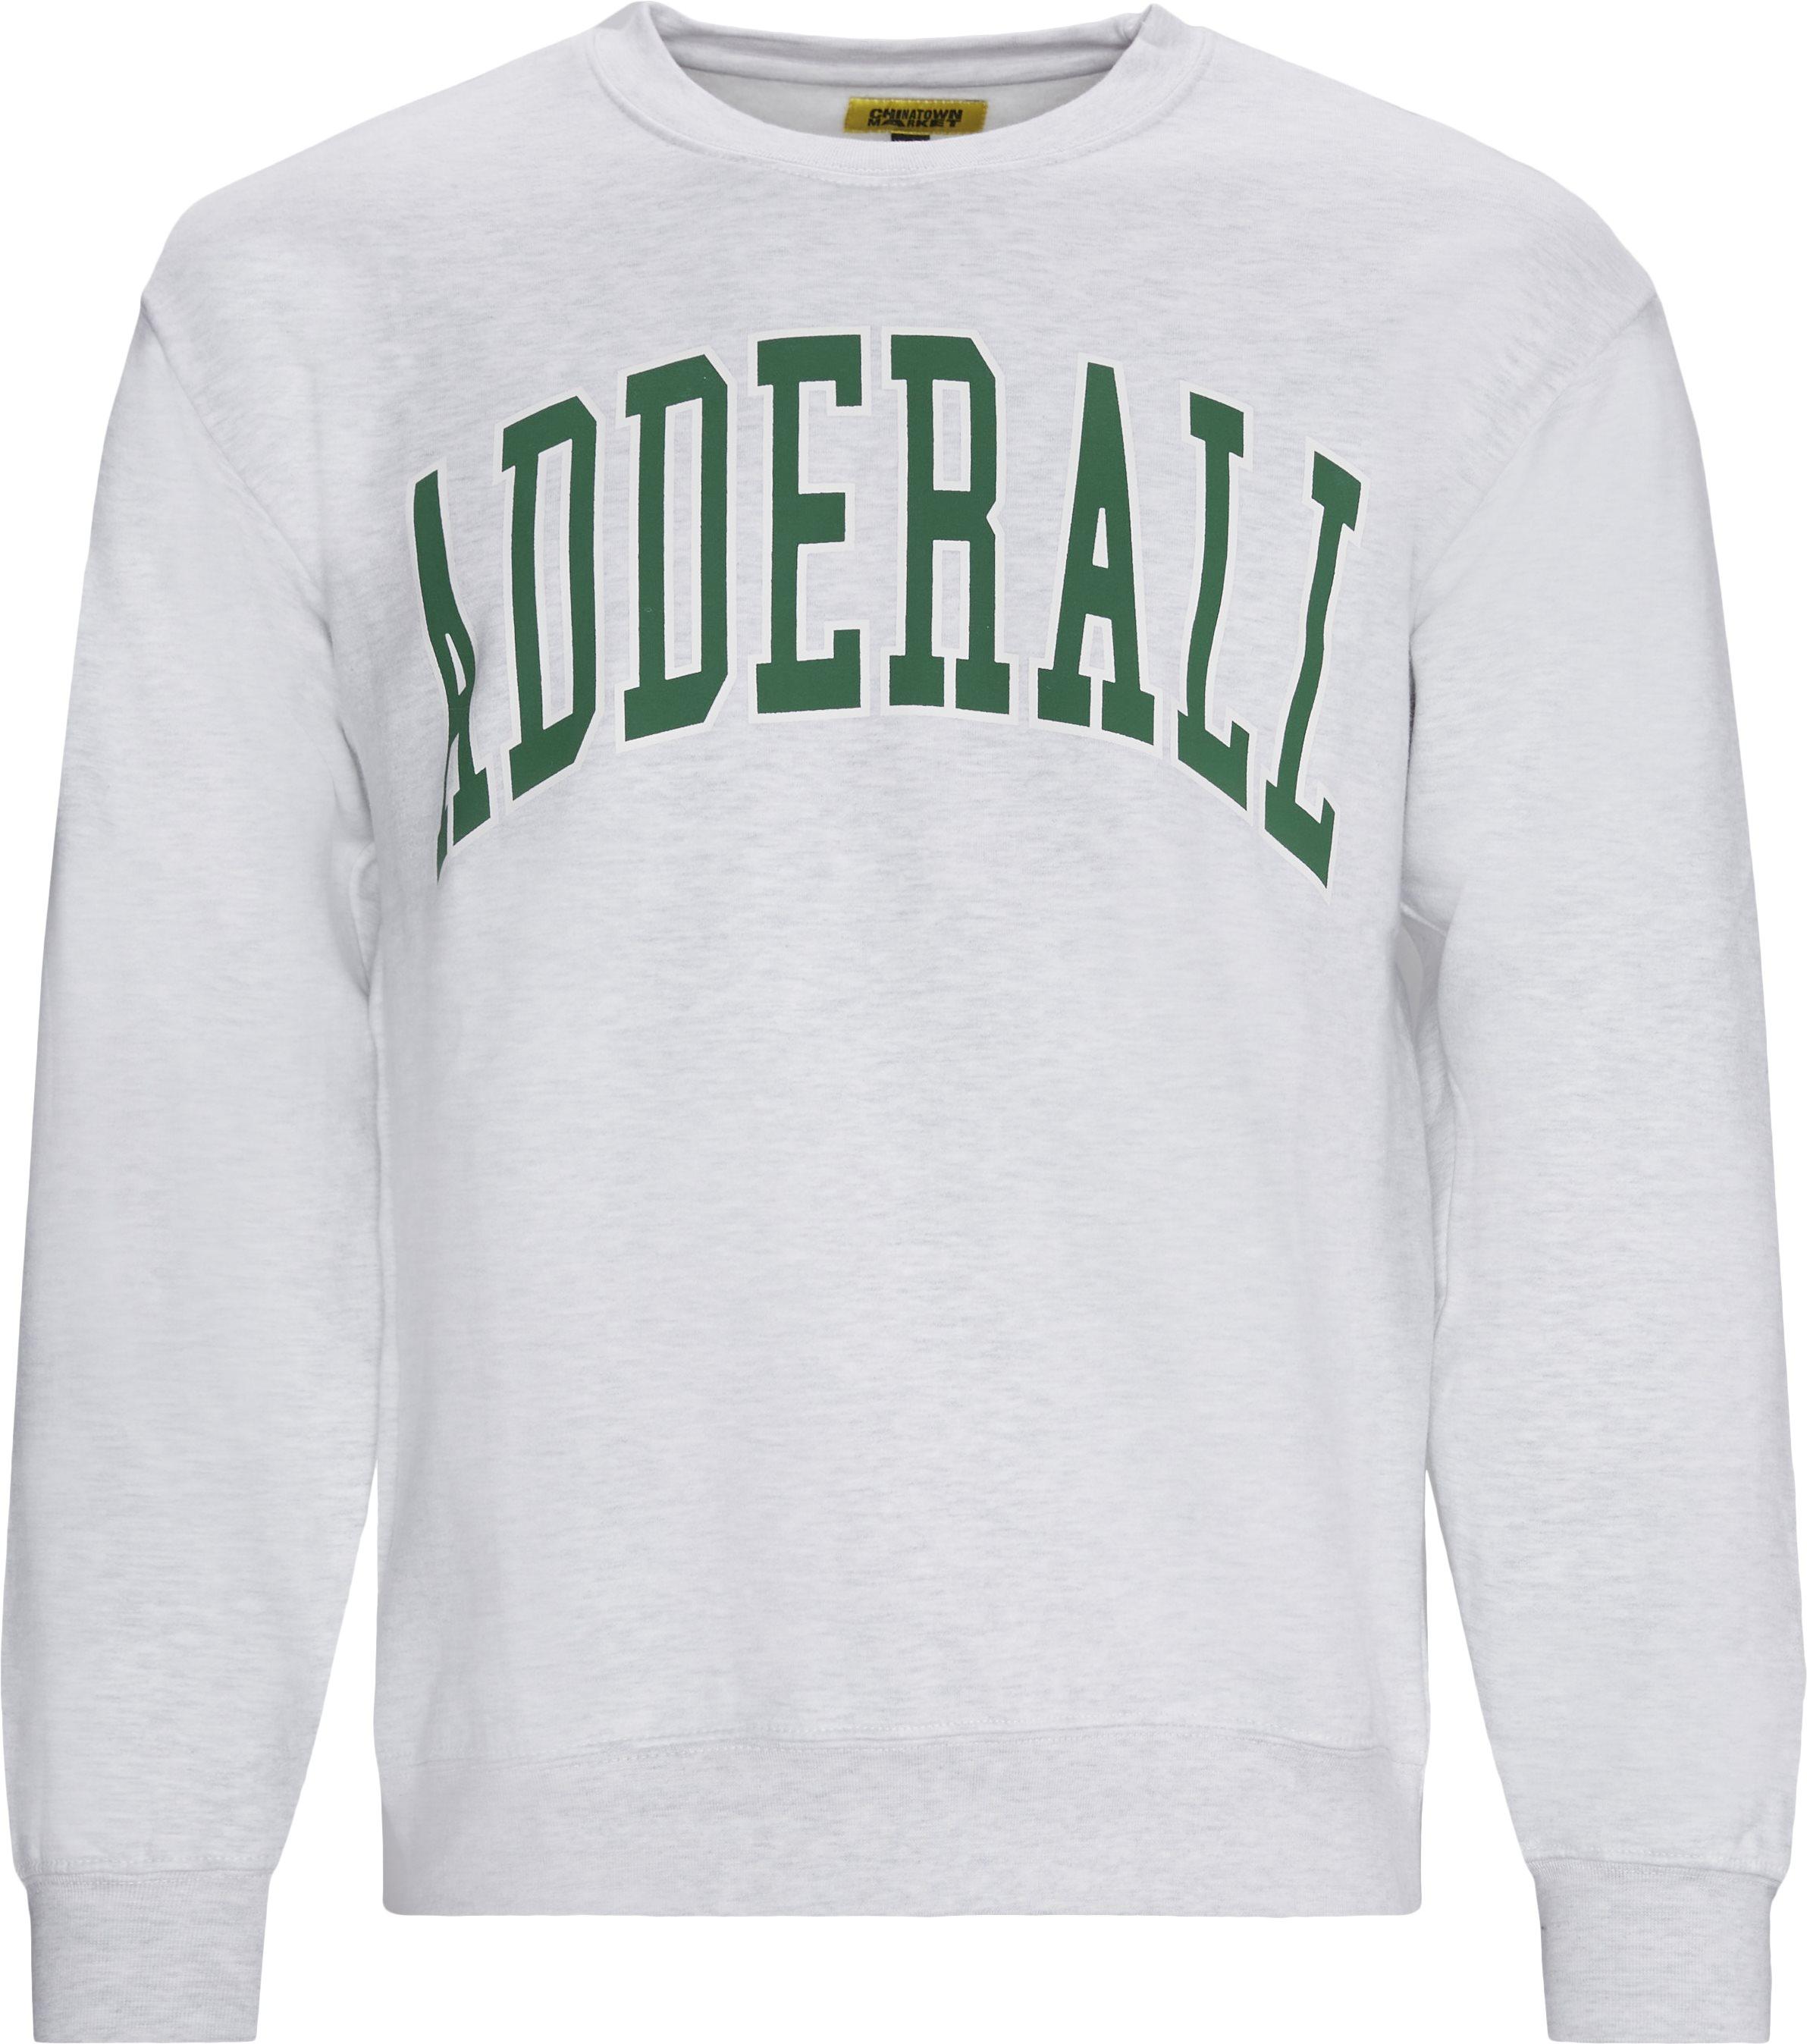 Midterm Crewneck Sweatshirt - Sweatshirts - Regular fit - Grå